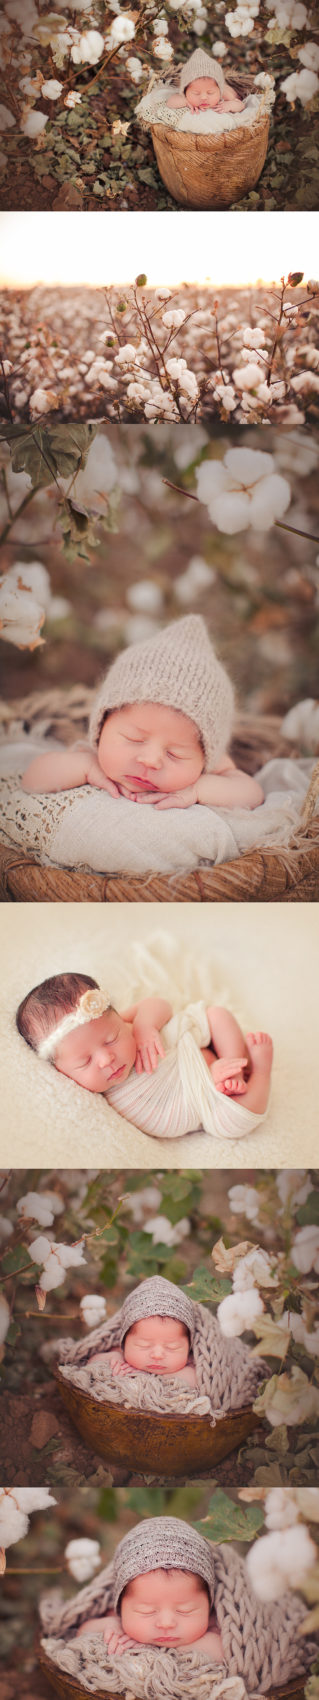 best newborn photography ideas Best Newborn Photography Ideas